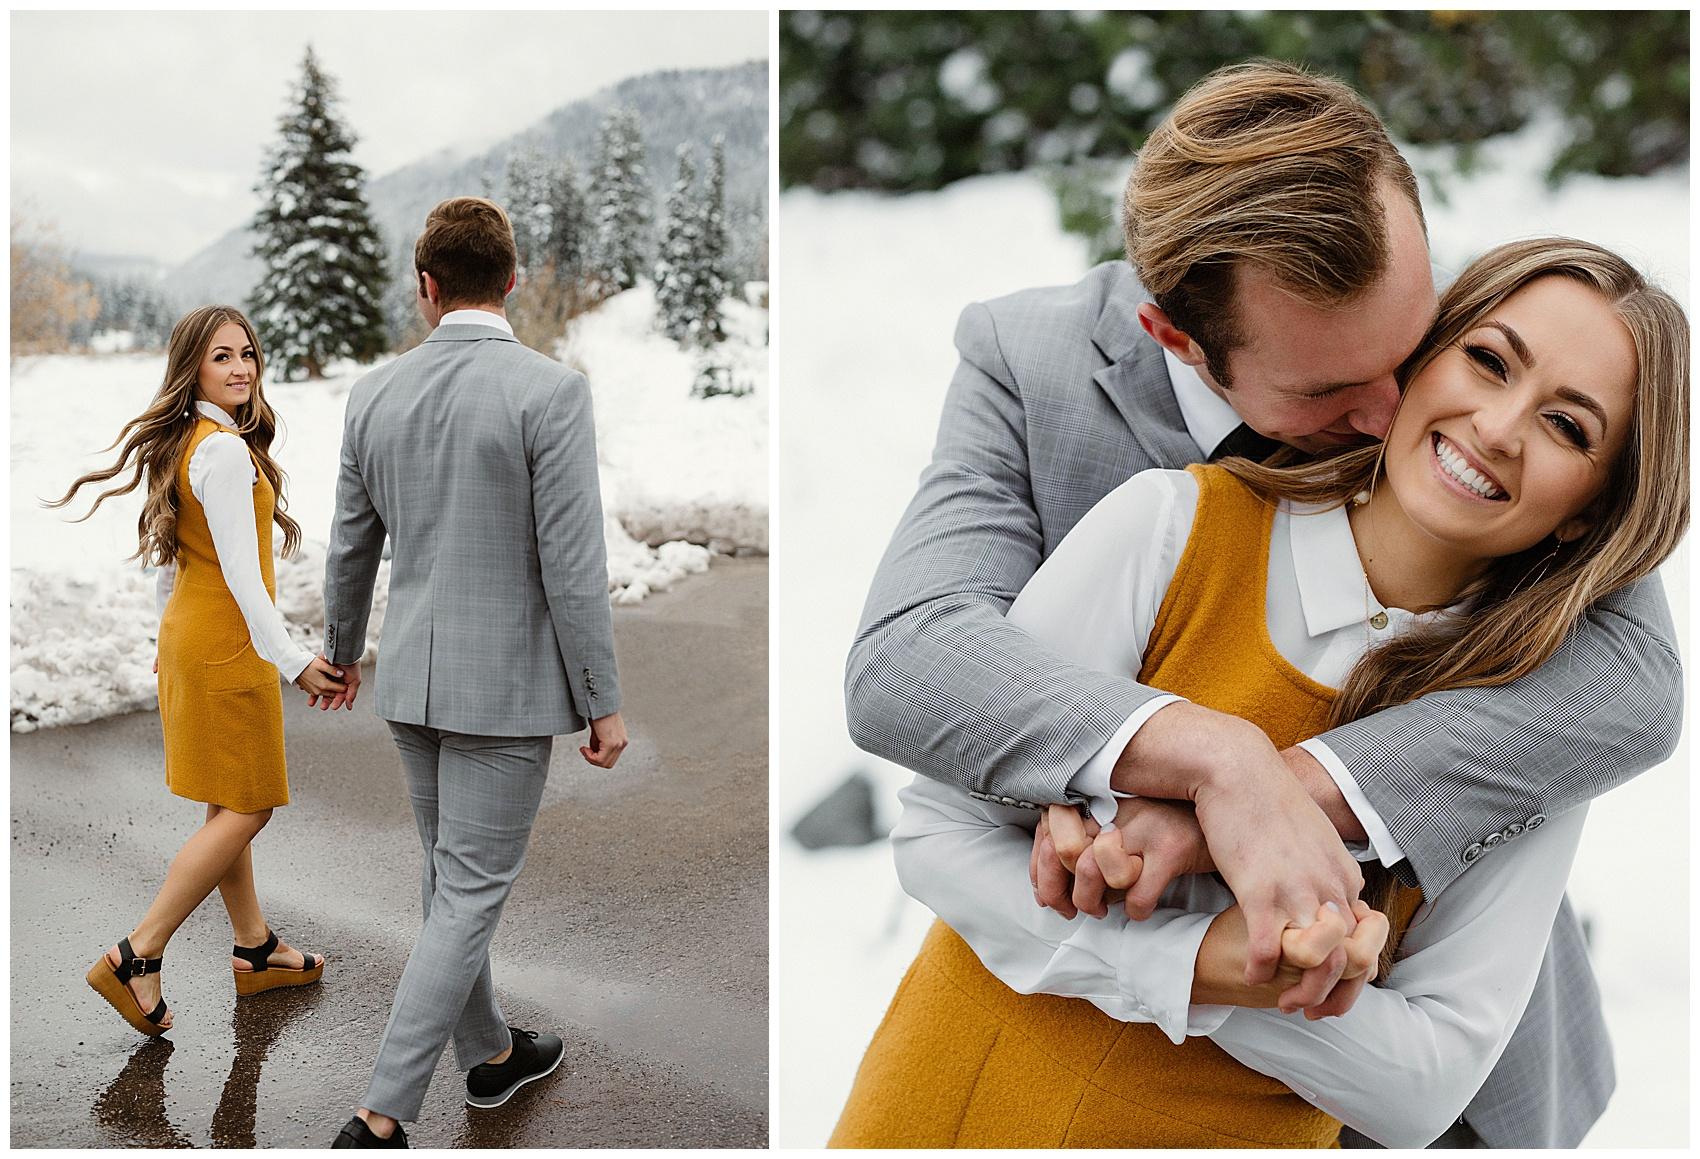 fall winter engagement photographer in utah